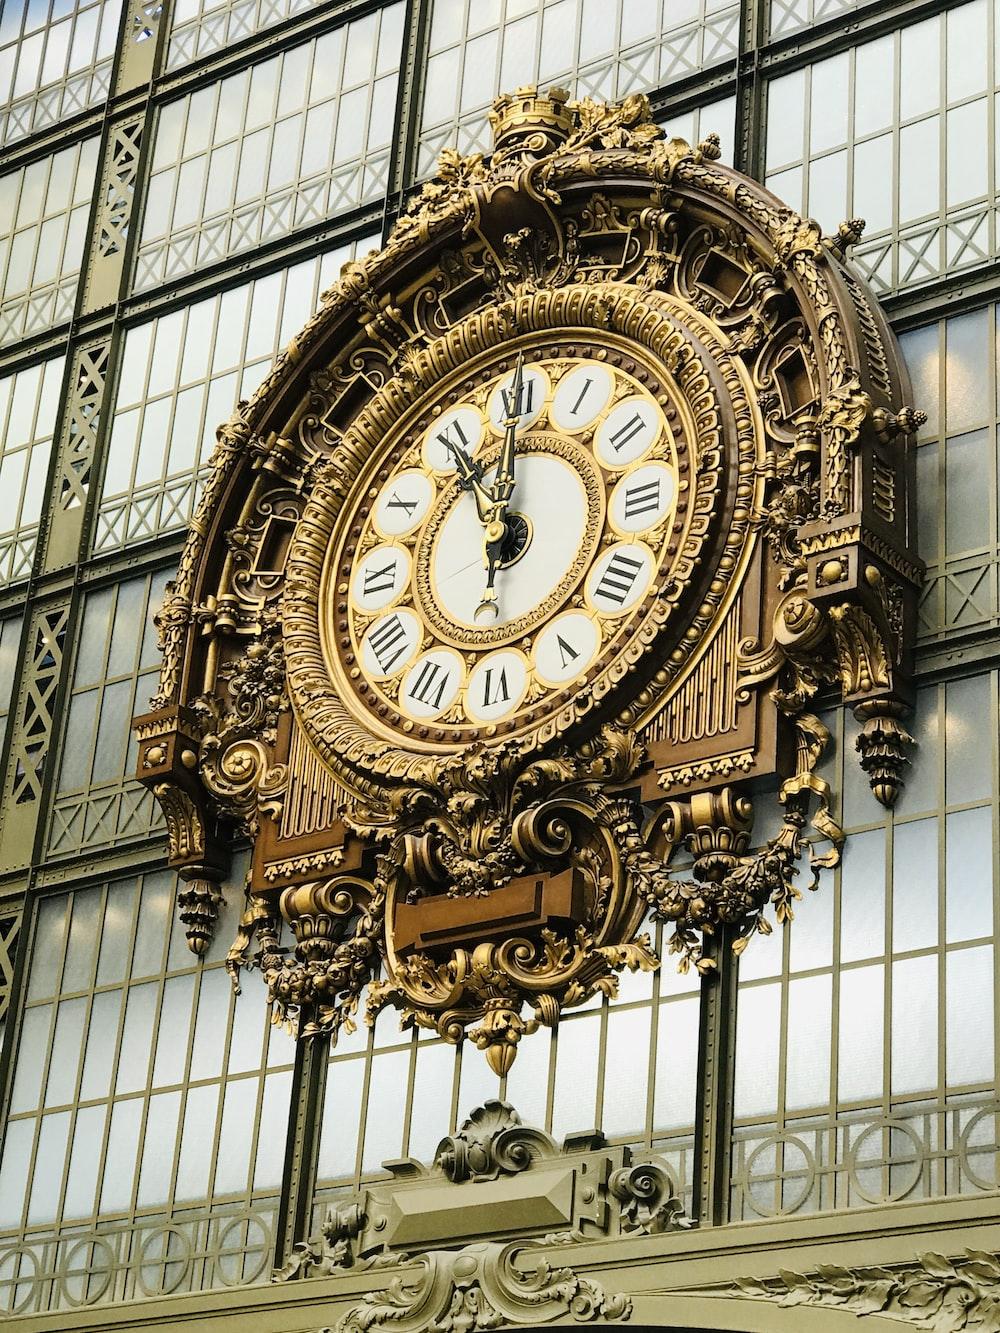 gold and white decorative analog clock